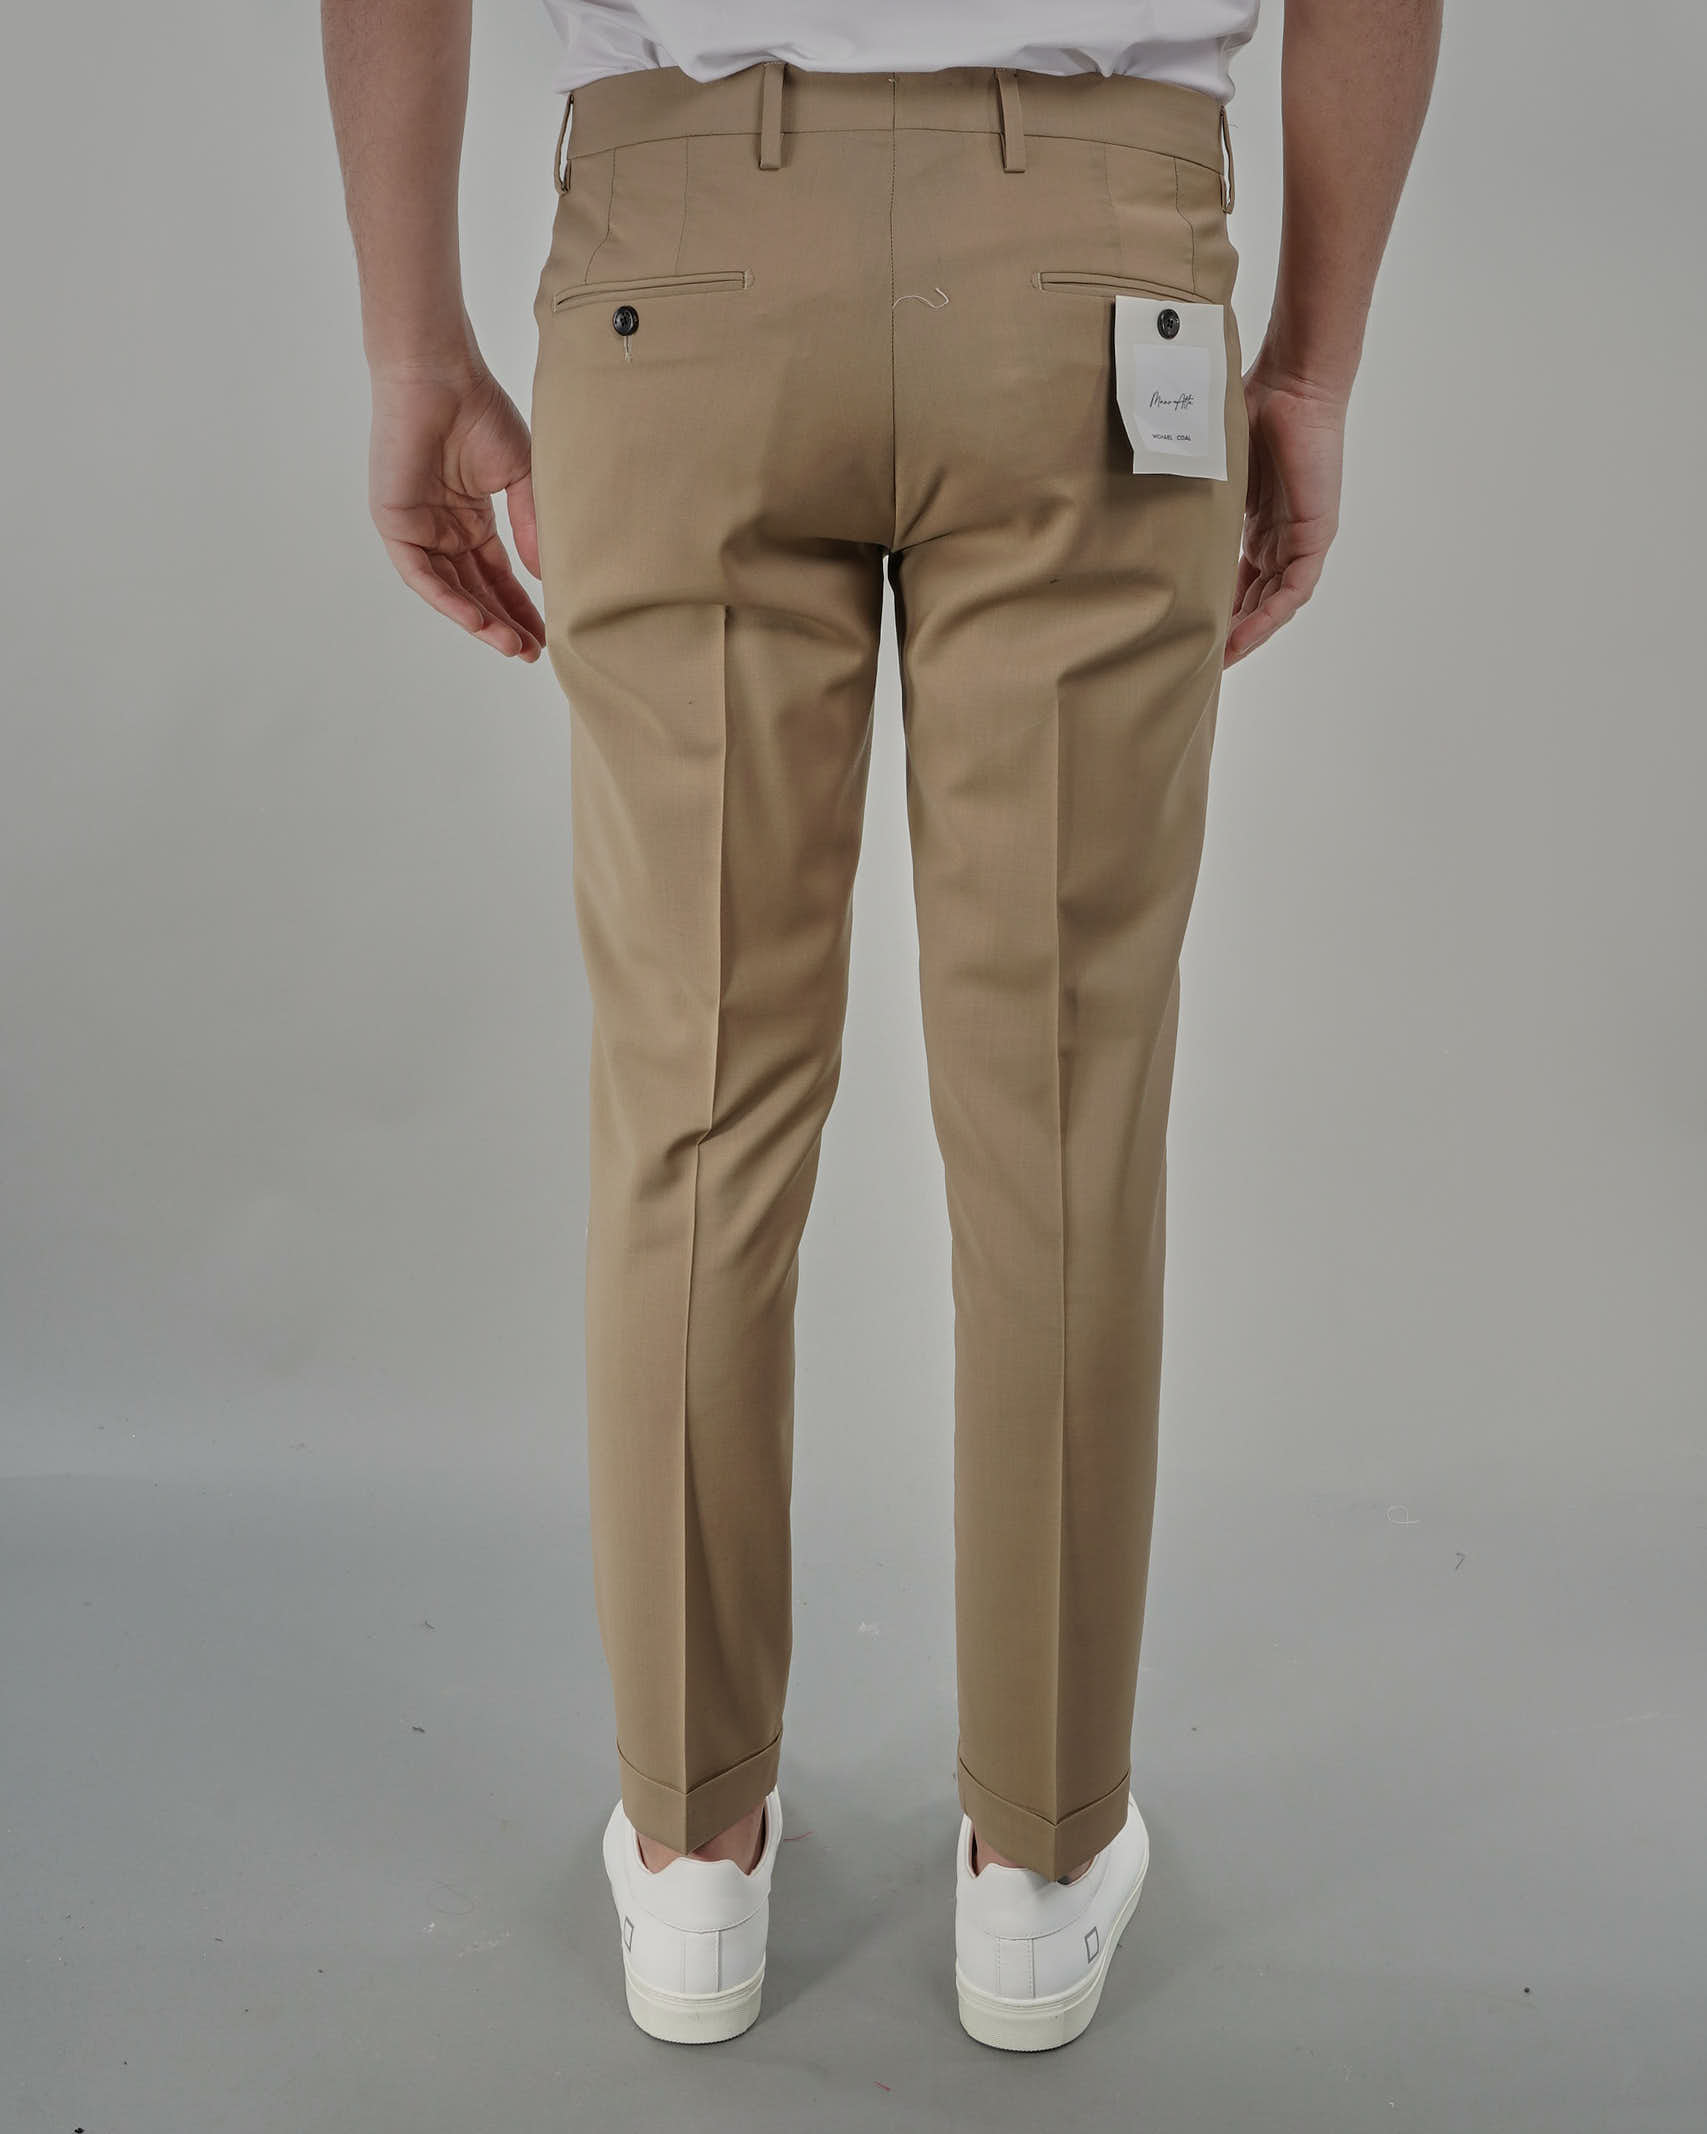 Pantalone in fresco lana Michael Coal MICHAEL COAL   Pantalone   BRAAM03667S21CBEIGE